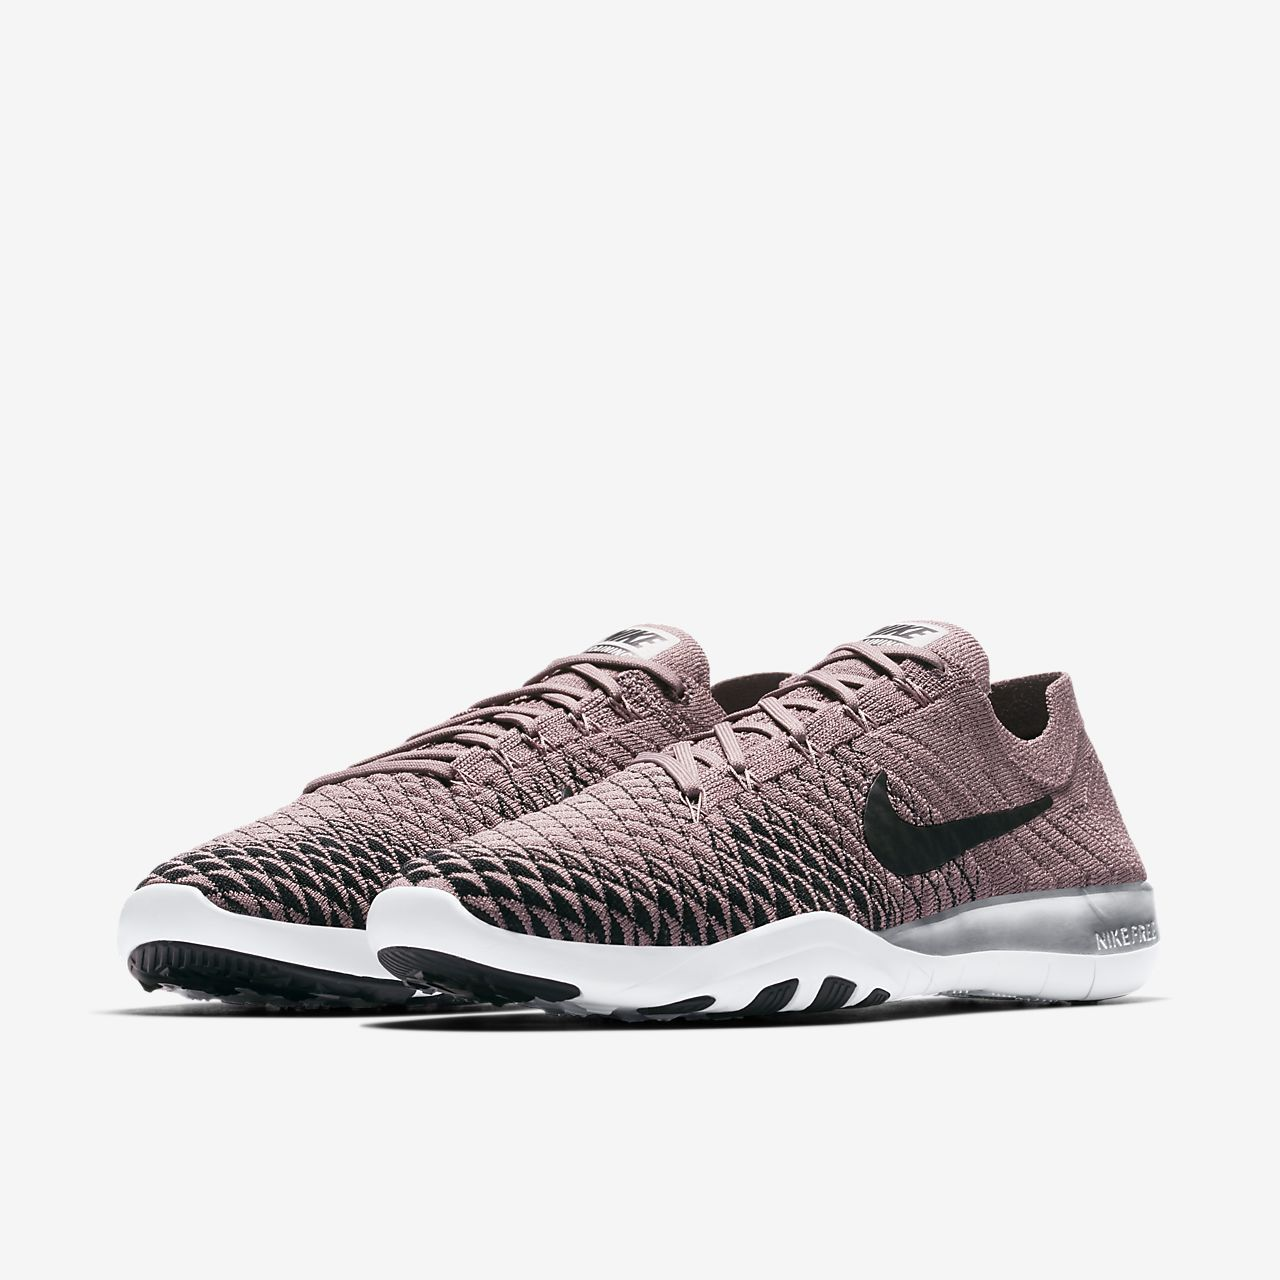 Nike Free TR Flyknit 2 Chrome Blush Women s Training Shoe  1c009f57a